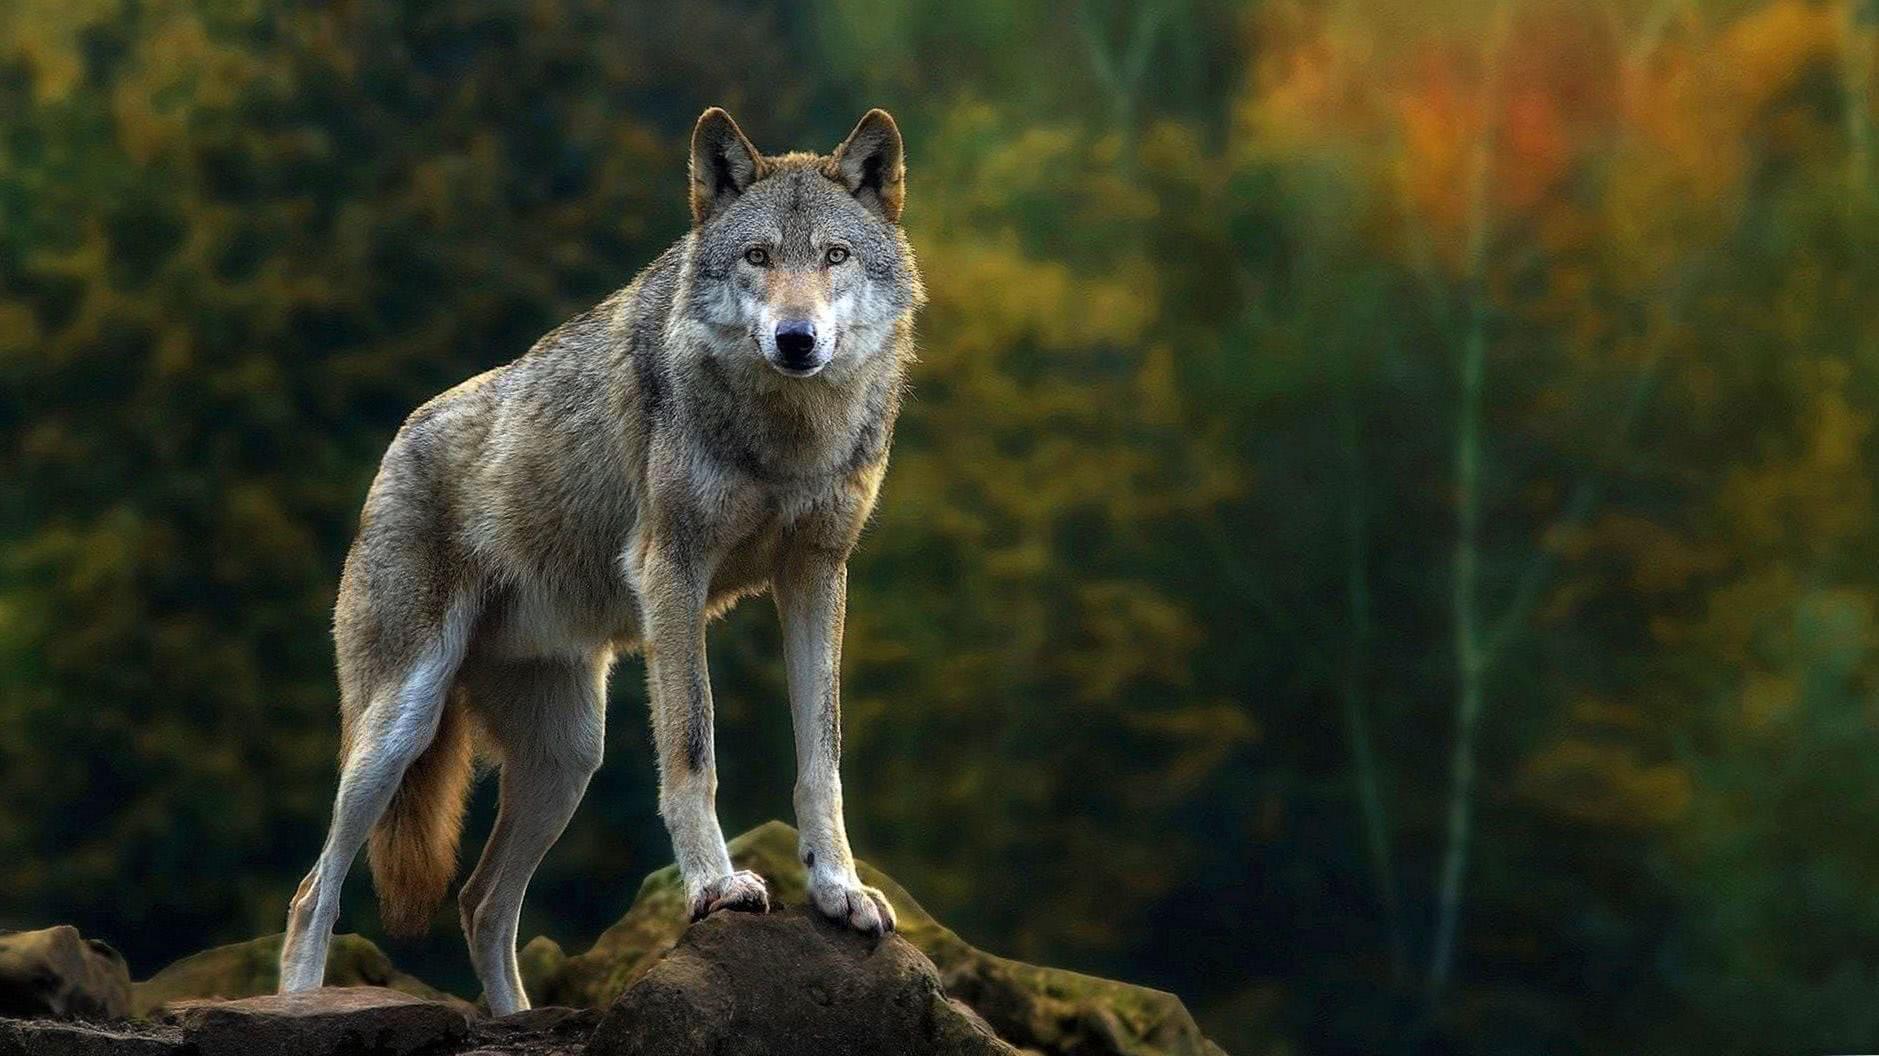 HD Wolves Wallpaper